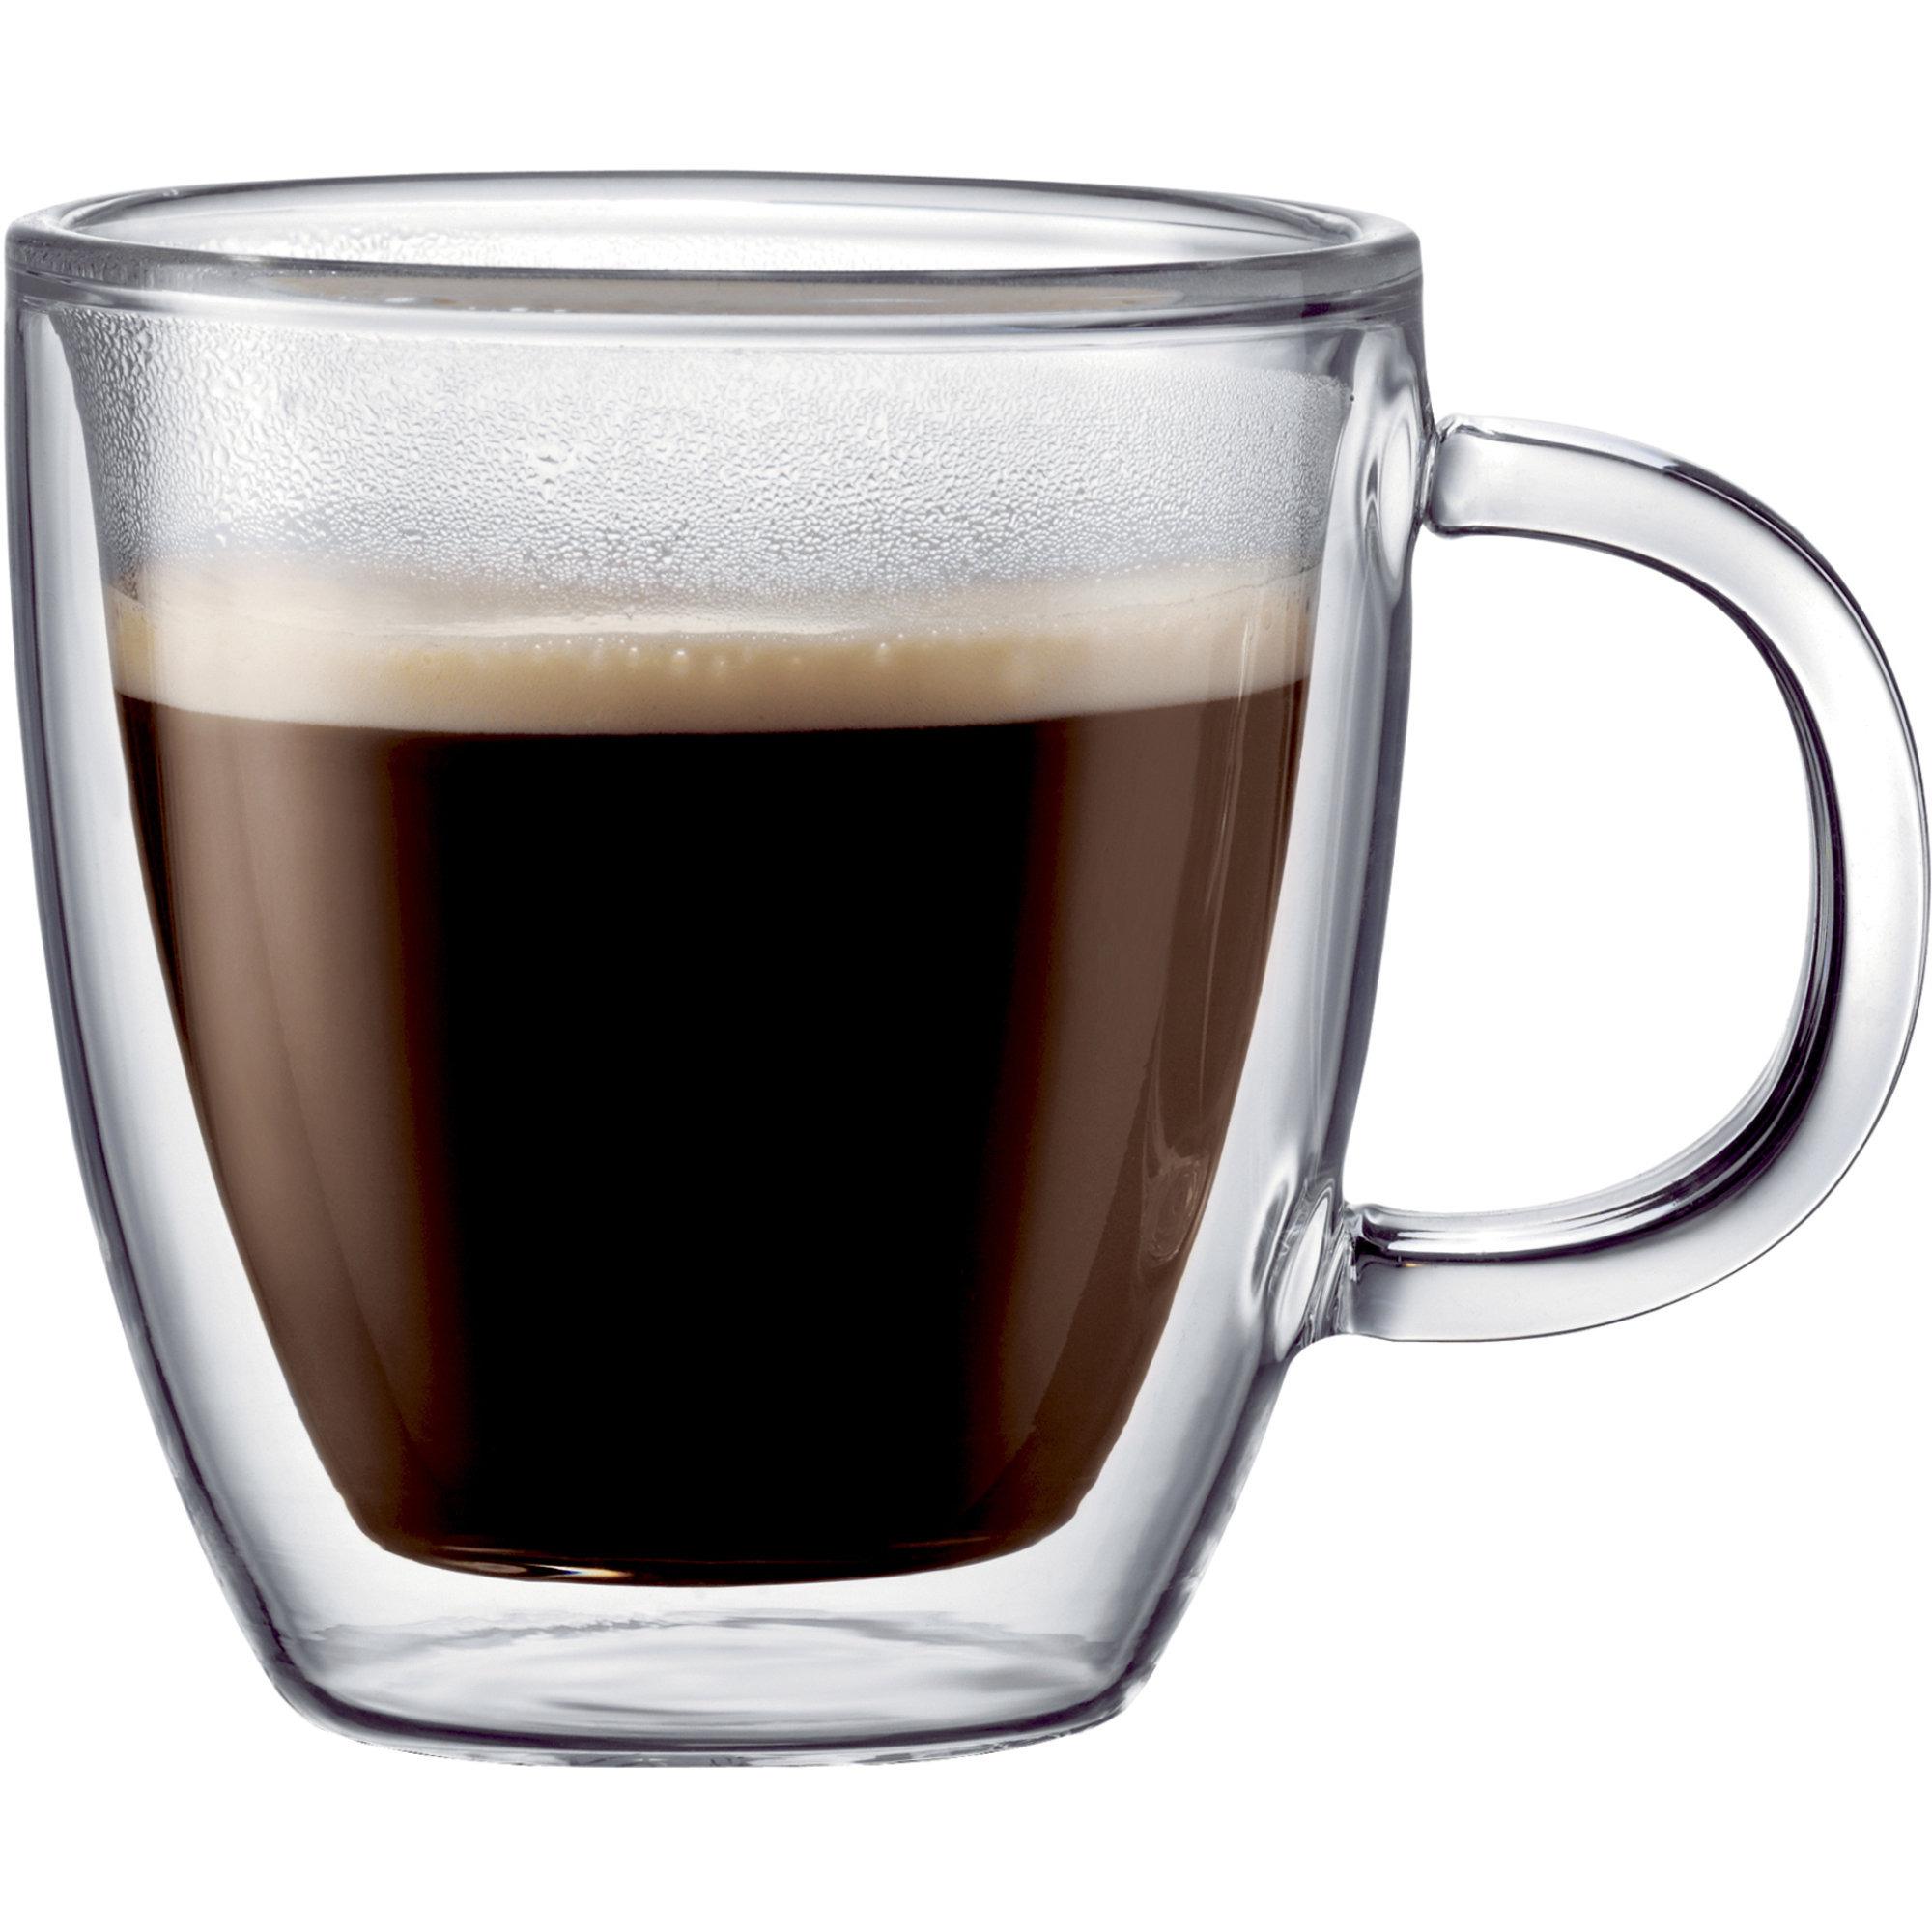 Bodum BISTRO dubbelväggat espressoglas m. handtag 2 st.